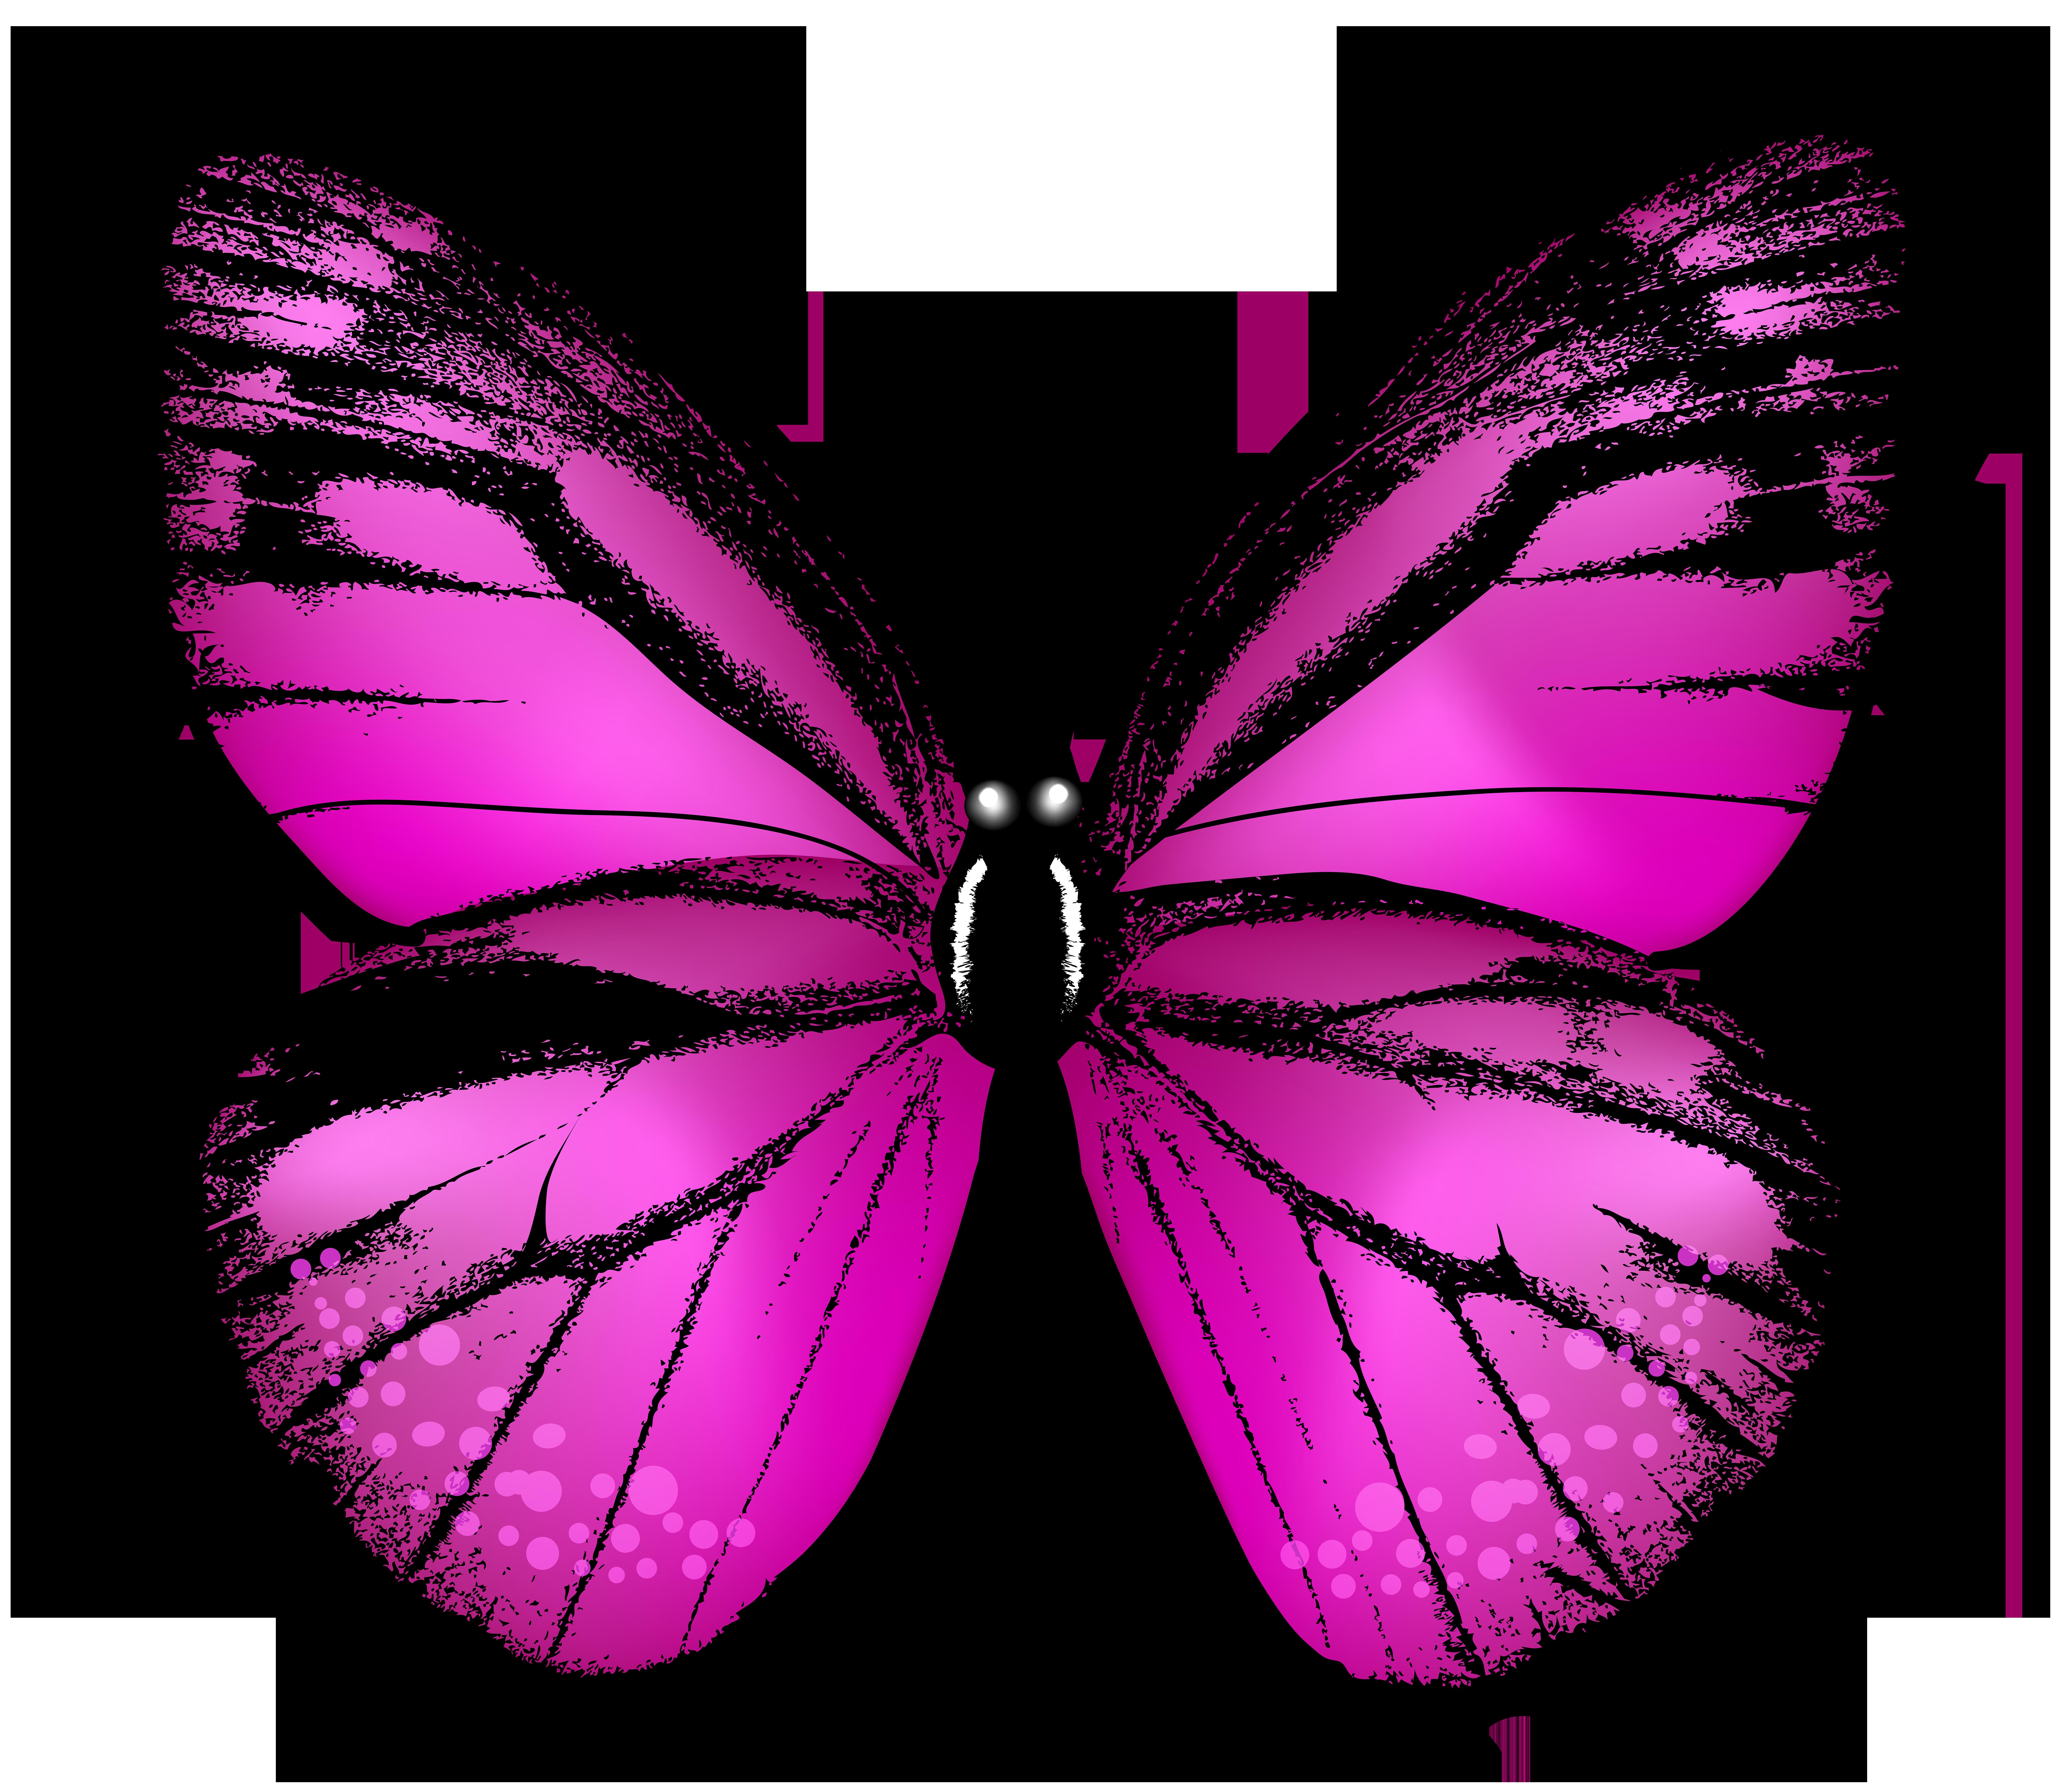 8000x6914 Pink Butterfly Transparent Clip Art Imageu200b Gallery Yopriceville